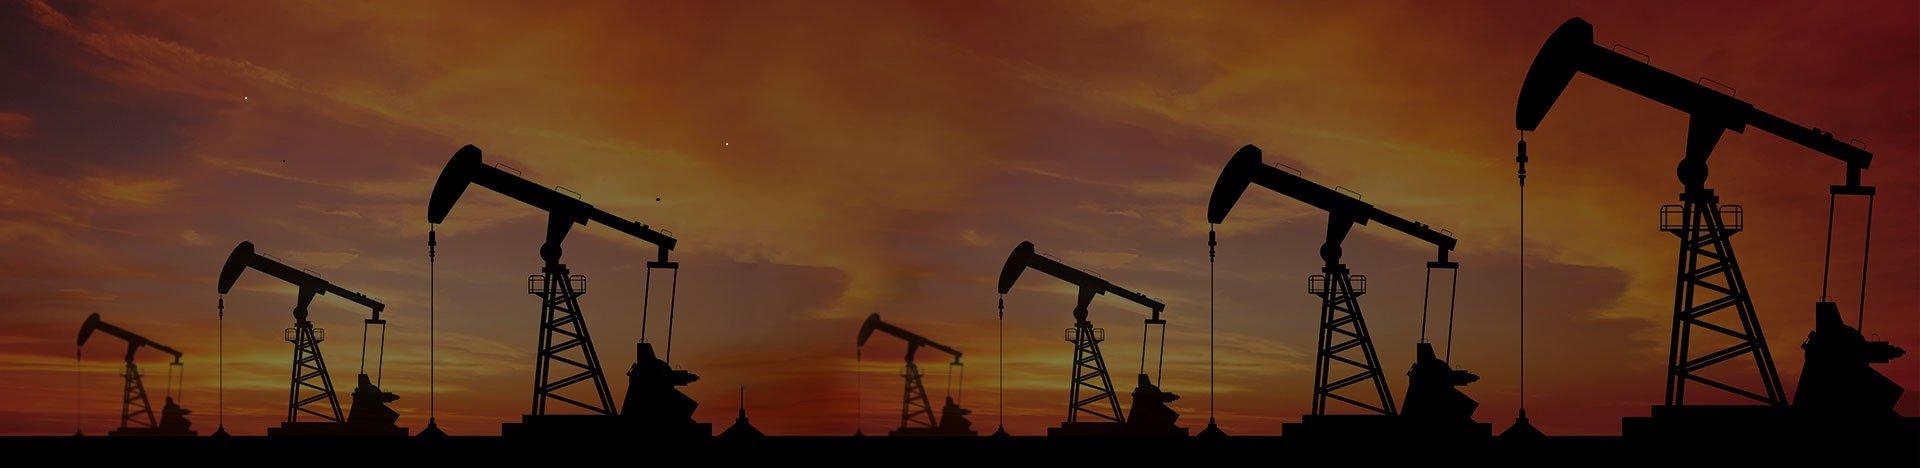 Digital Oil Fields_LPBanner